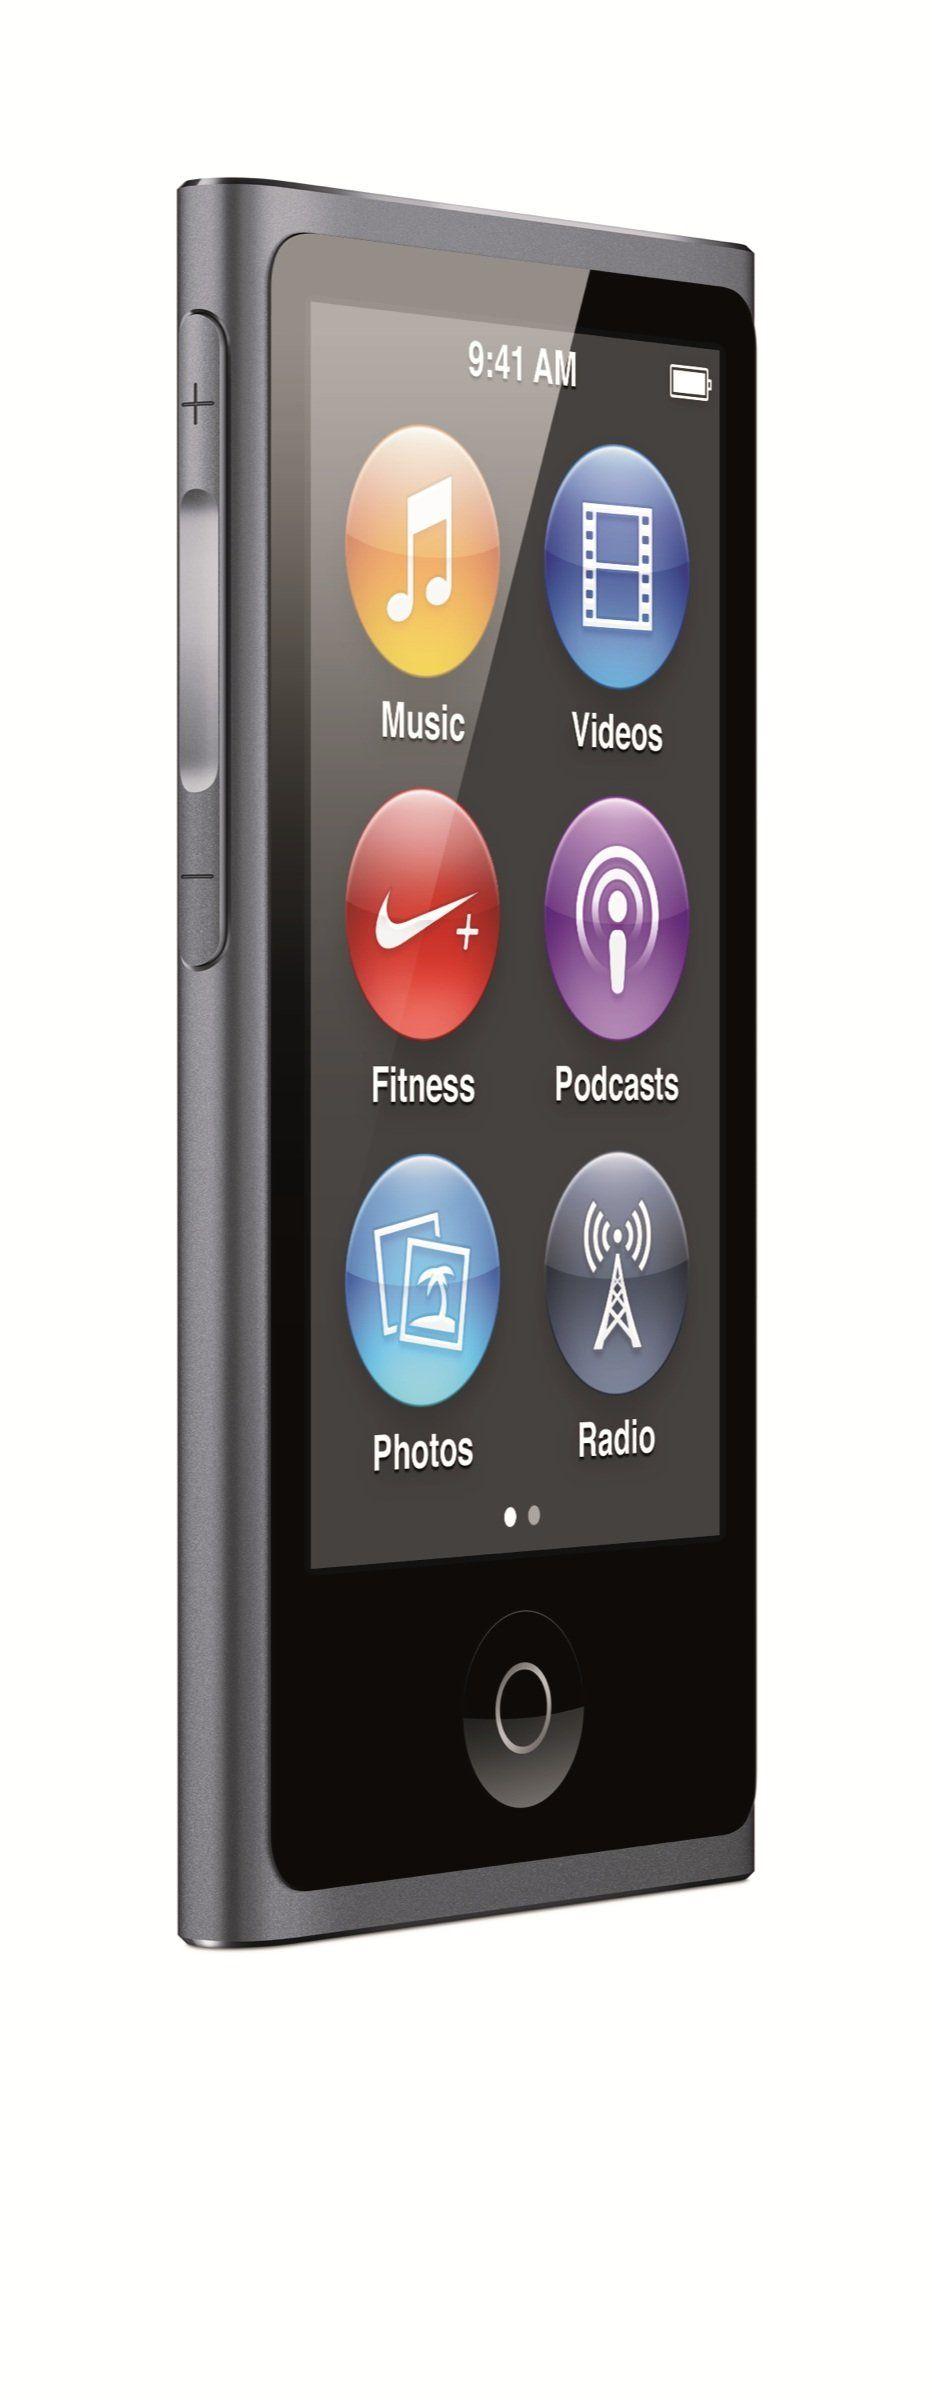 amazoncom apple ipod nano 16 gb red 5th generation - HD932×2400